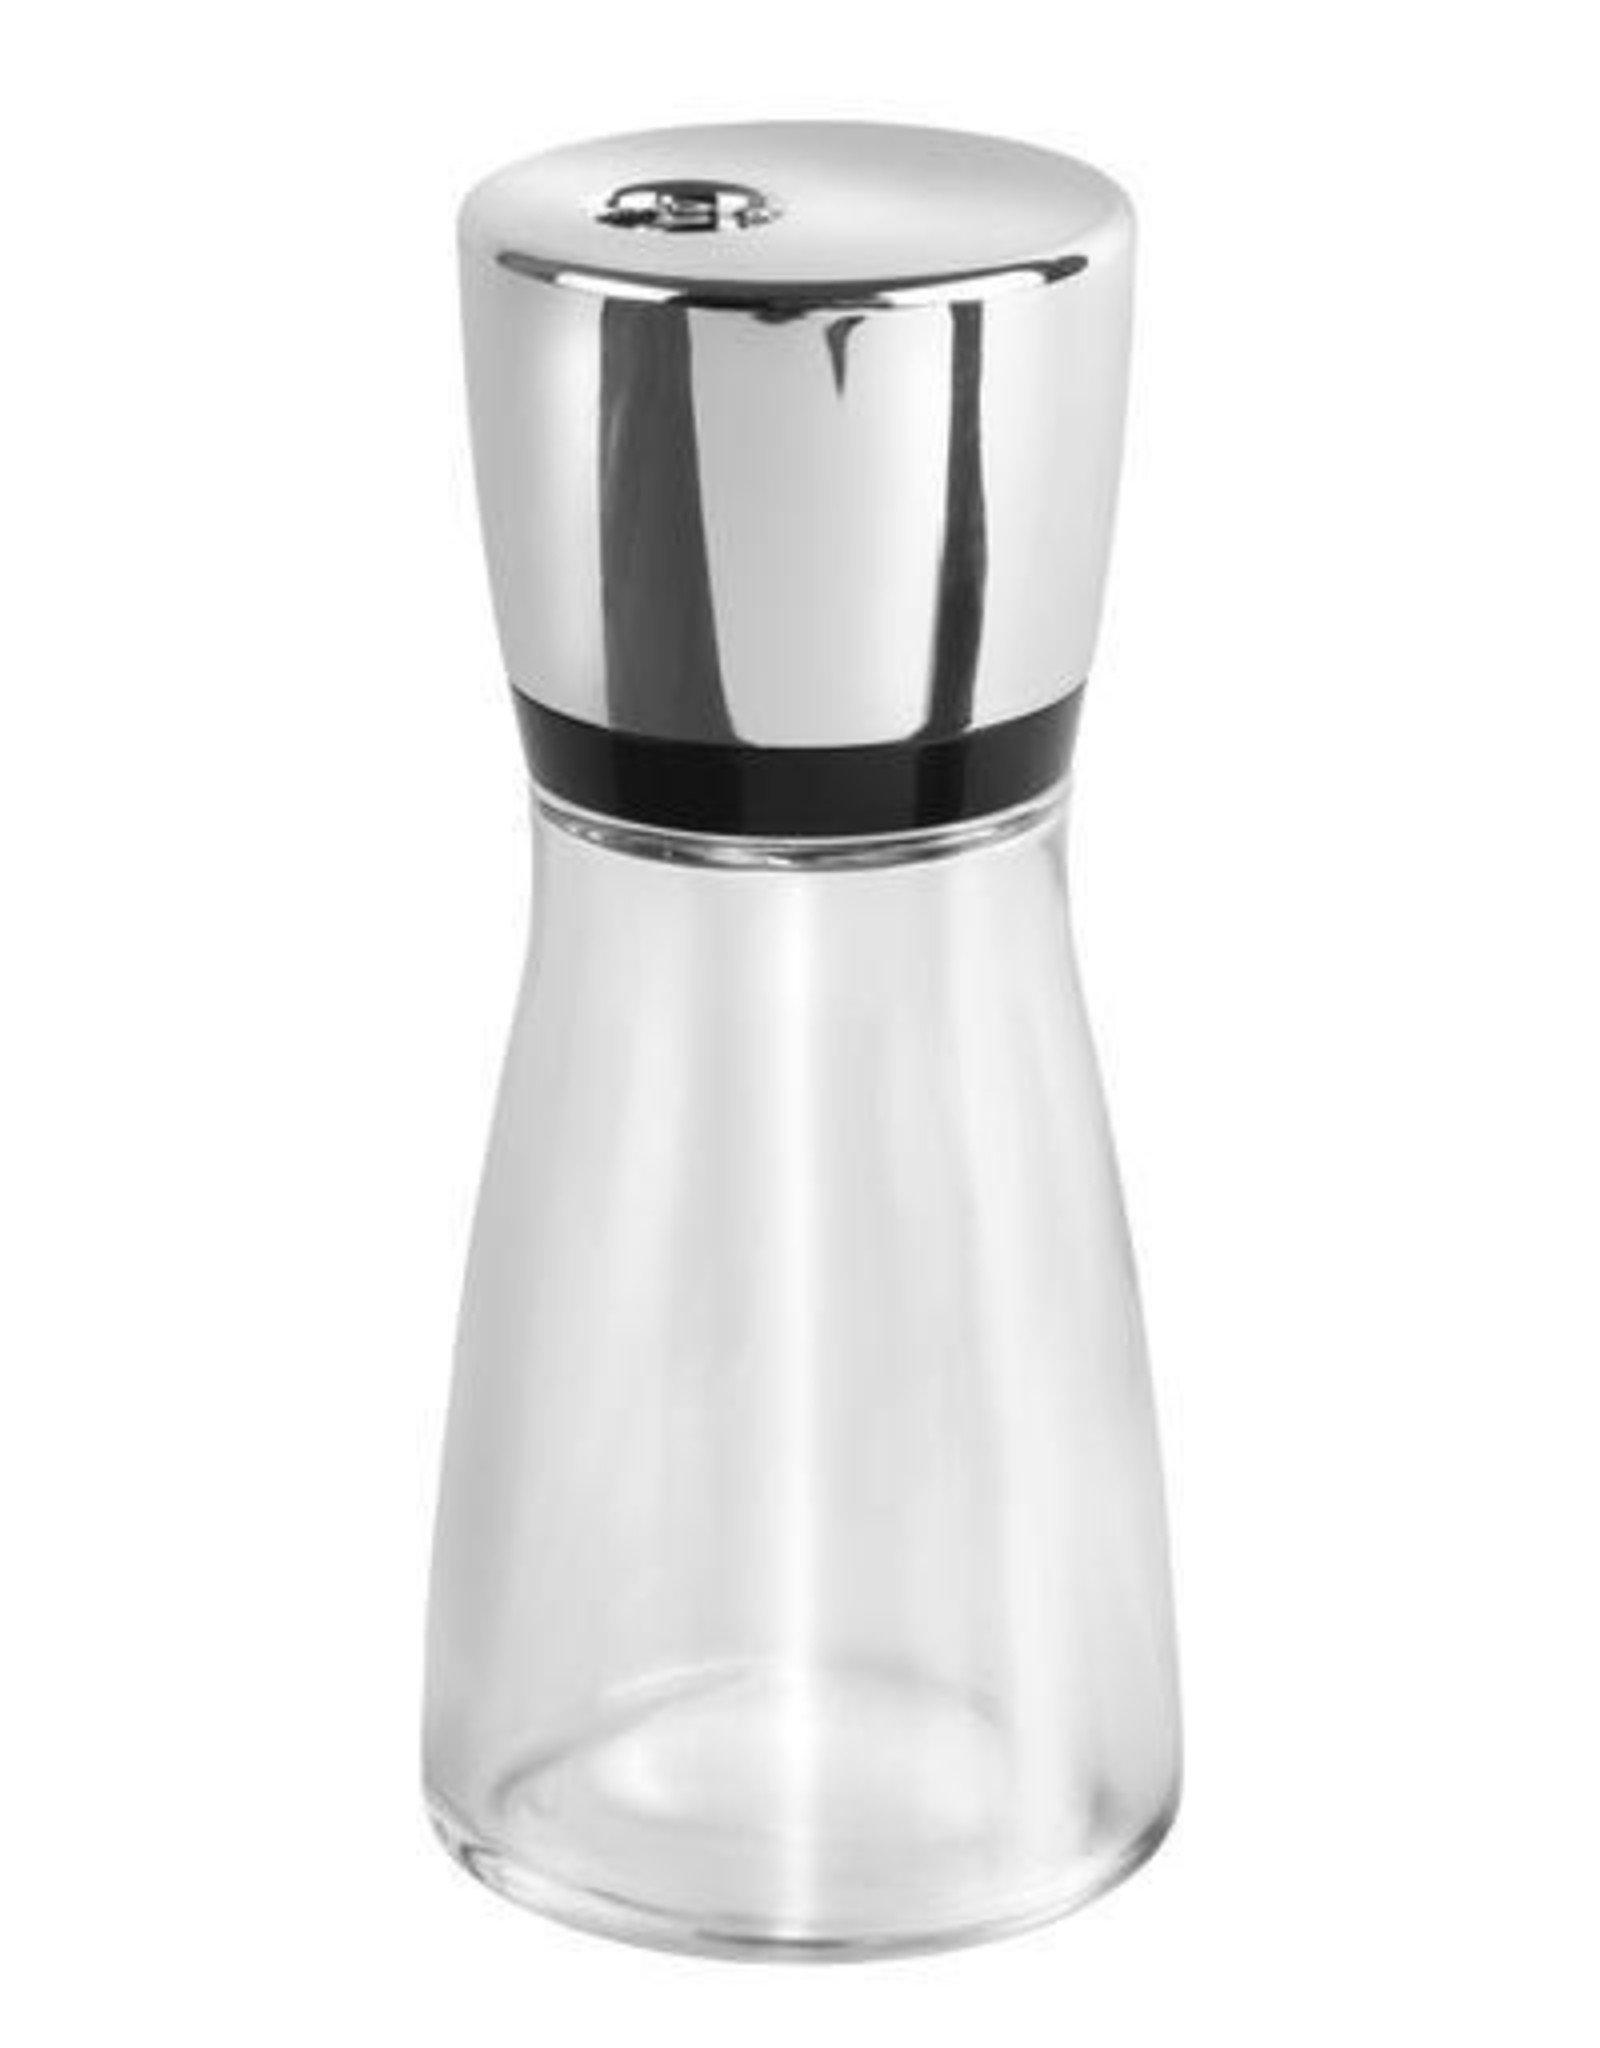 Cole & Mason Herb & Spice Jar, Glass & Chrome, 2.4oz